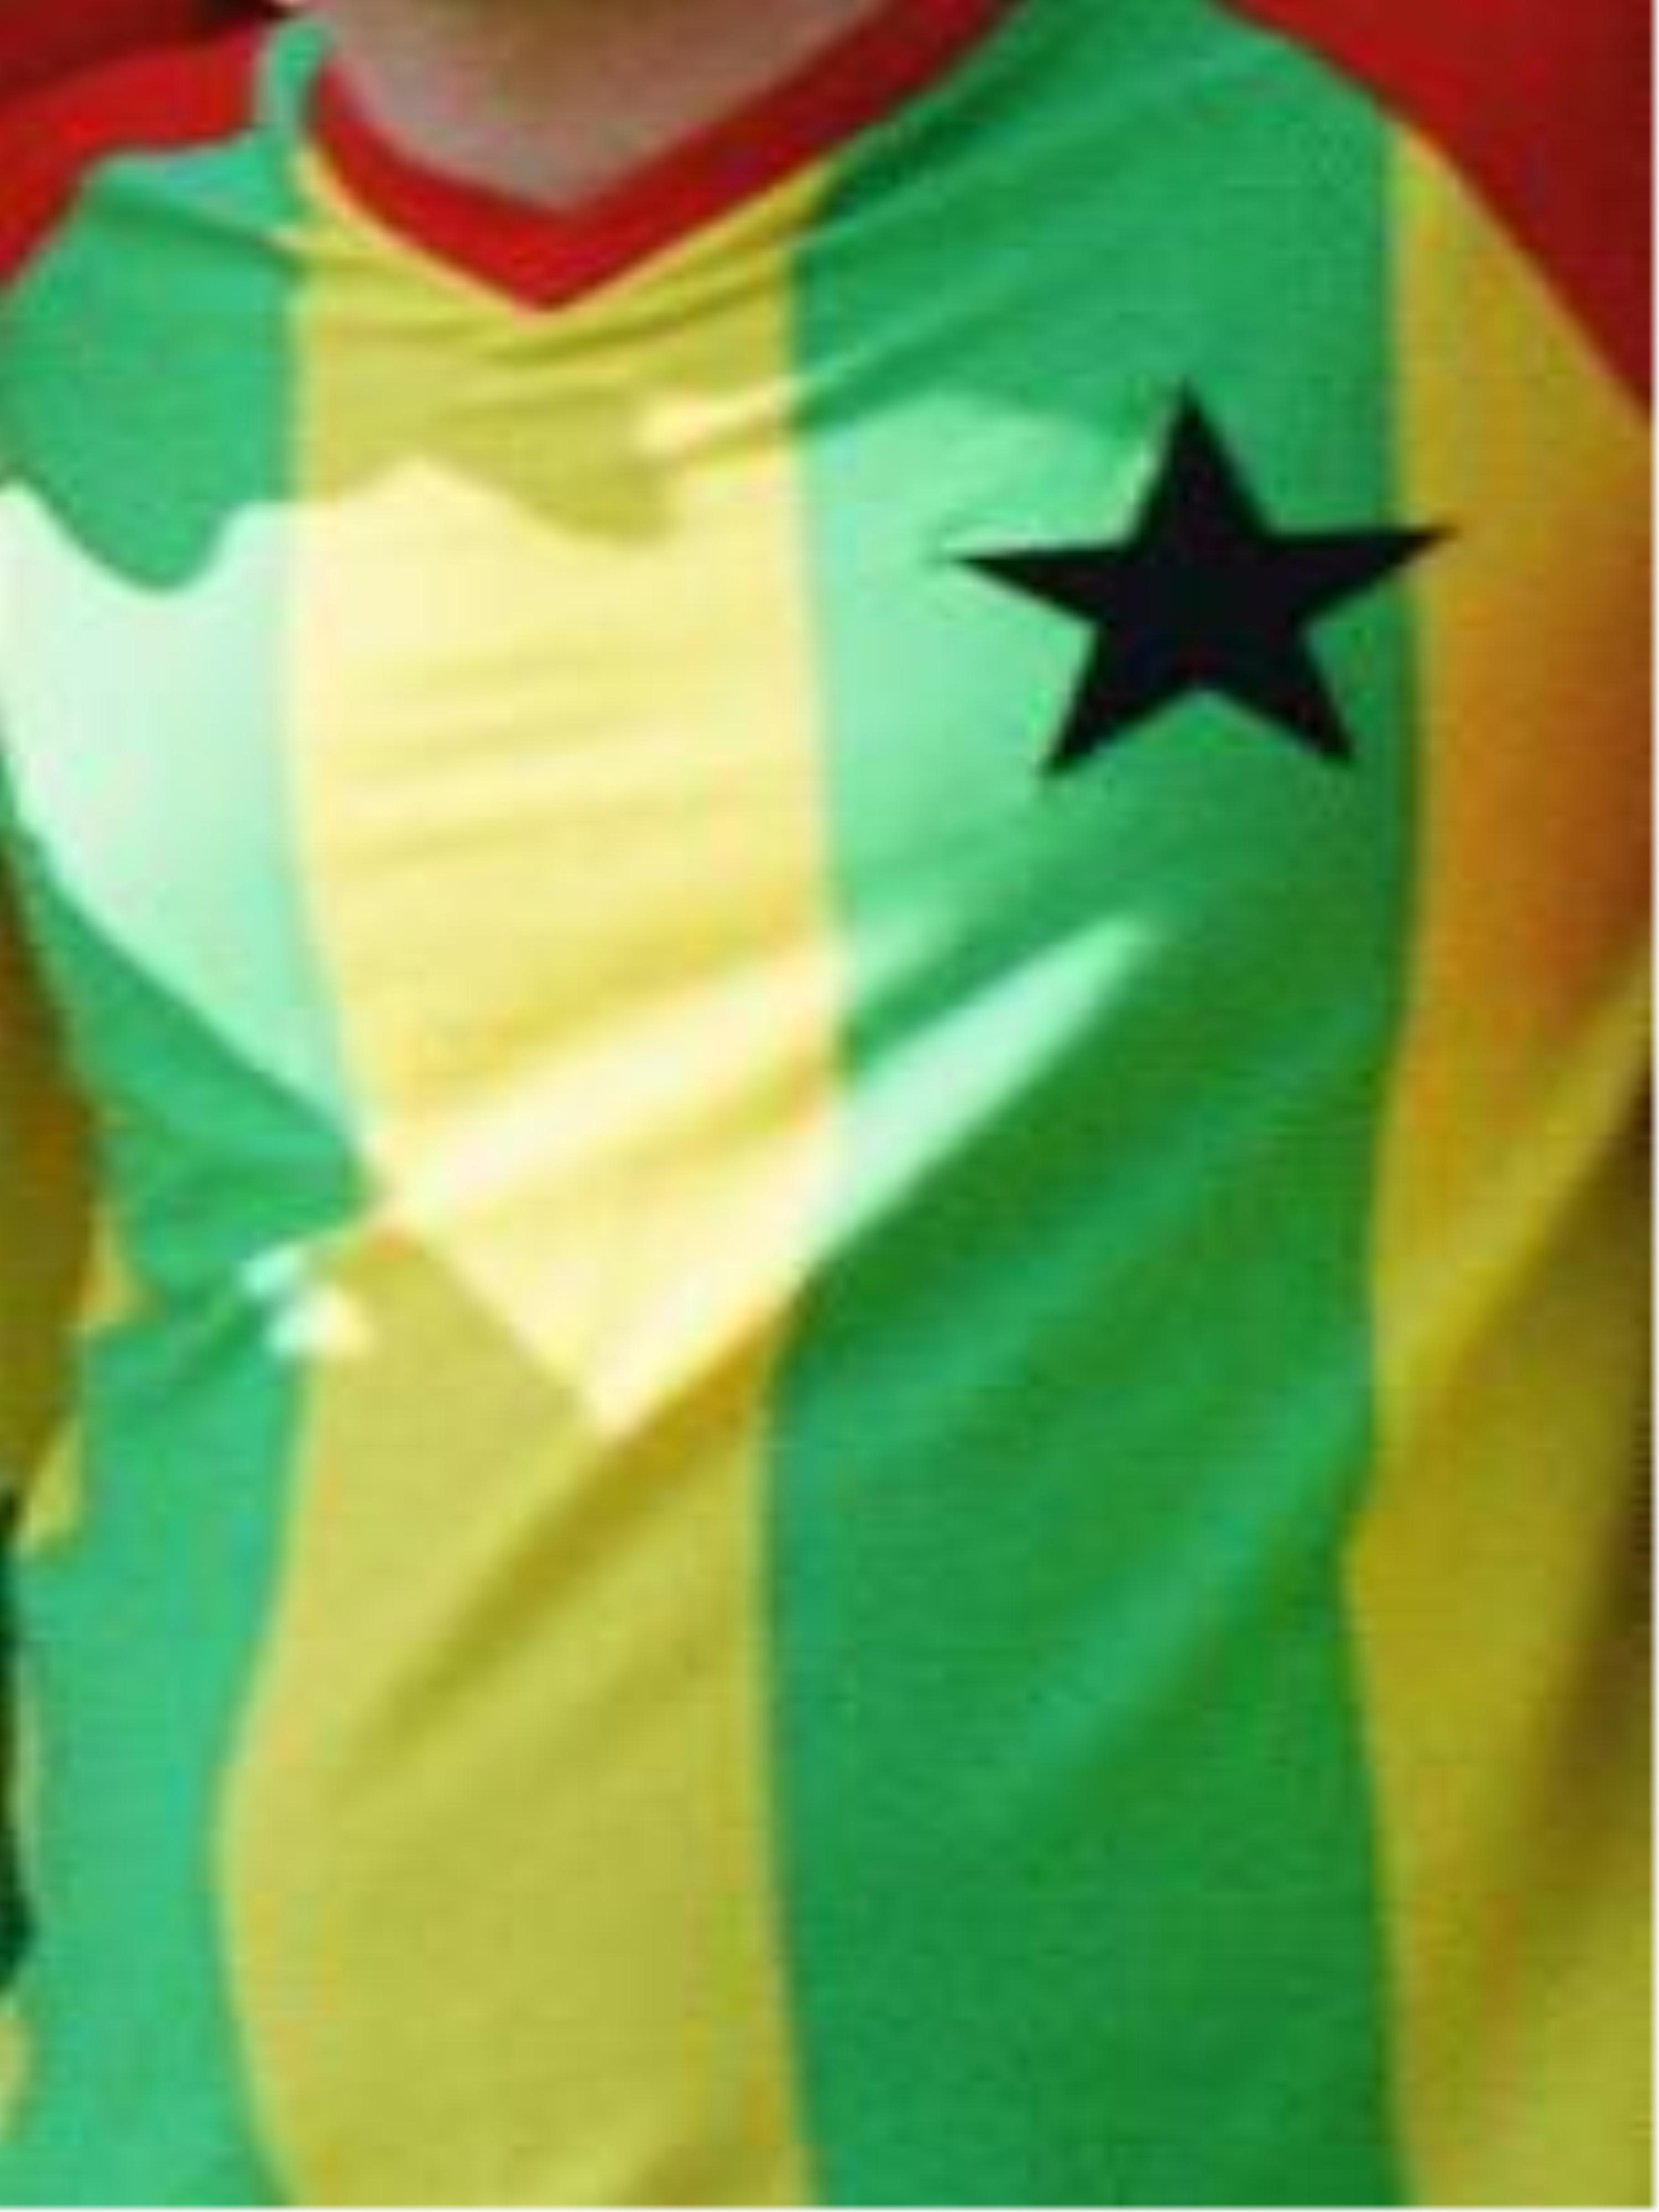 reputable site e0dbc 0b214 File:Black Stars (Ghana national football team) Jersey 1970s ...